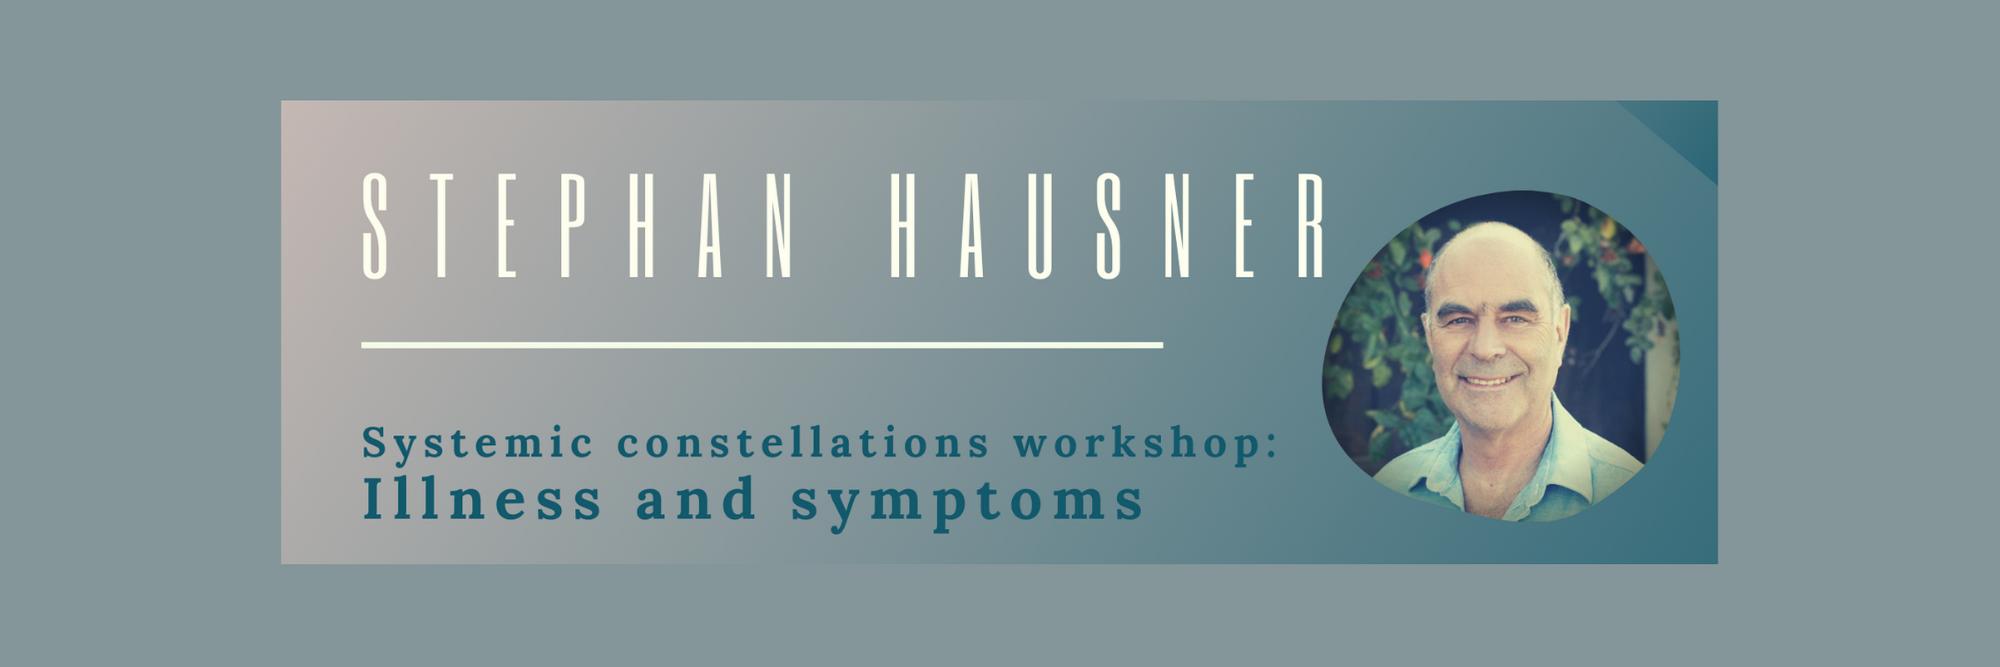 Stephan Hausner workshop